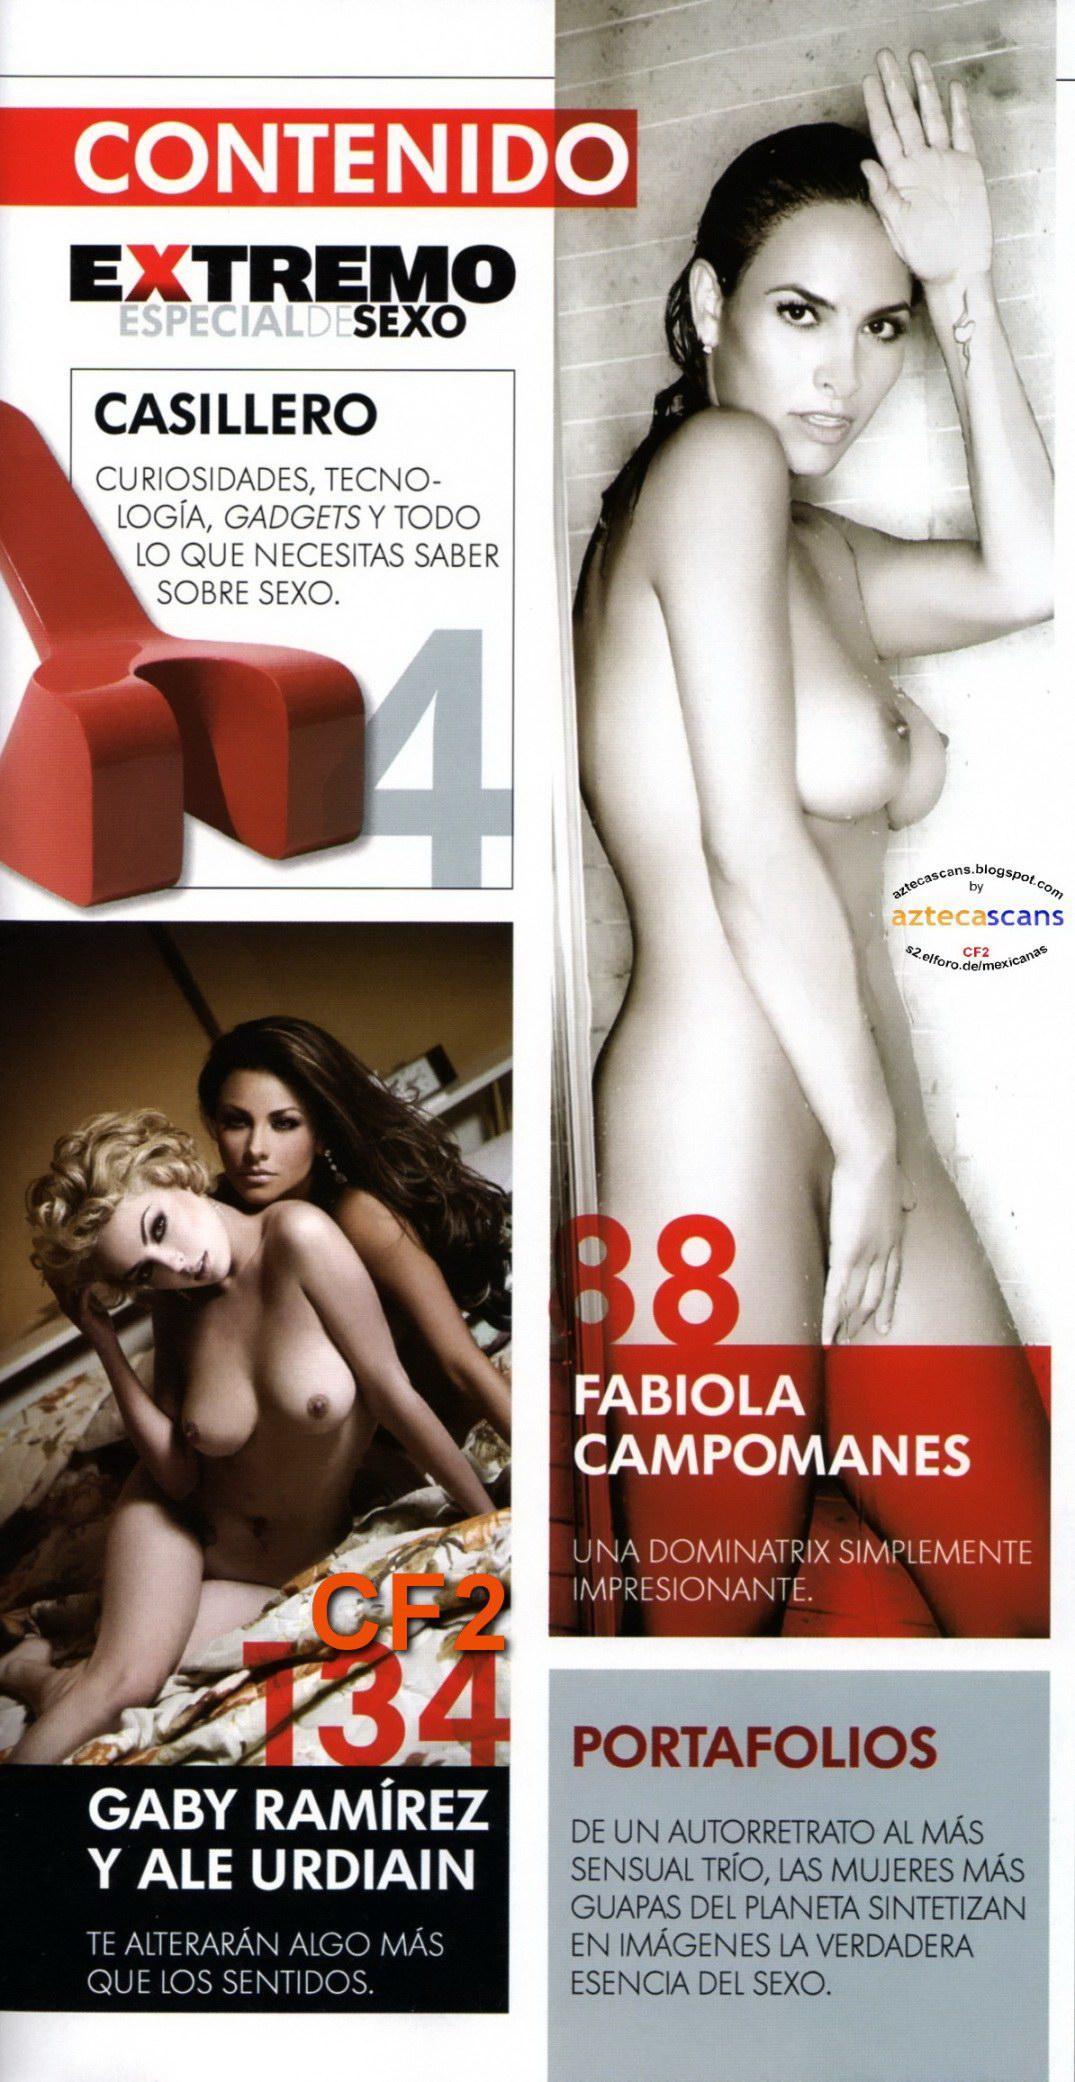 Fabiola campomanes revista h extremo pdf